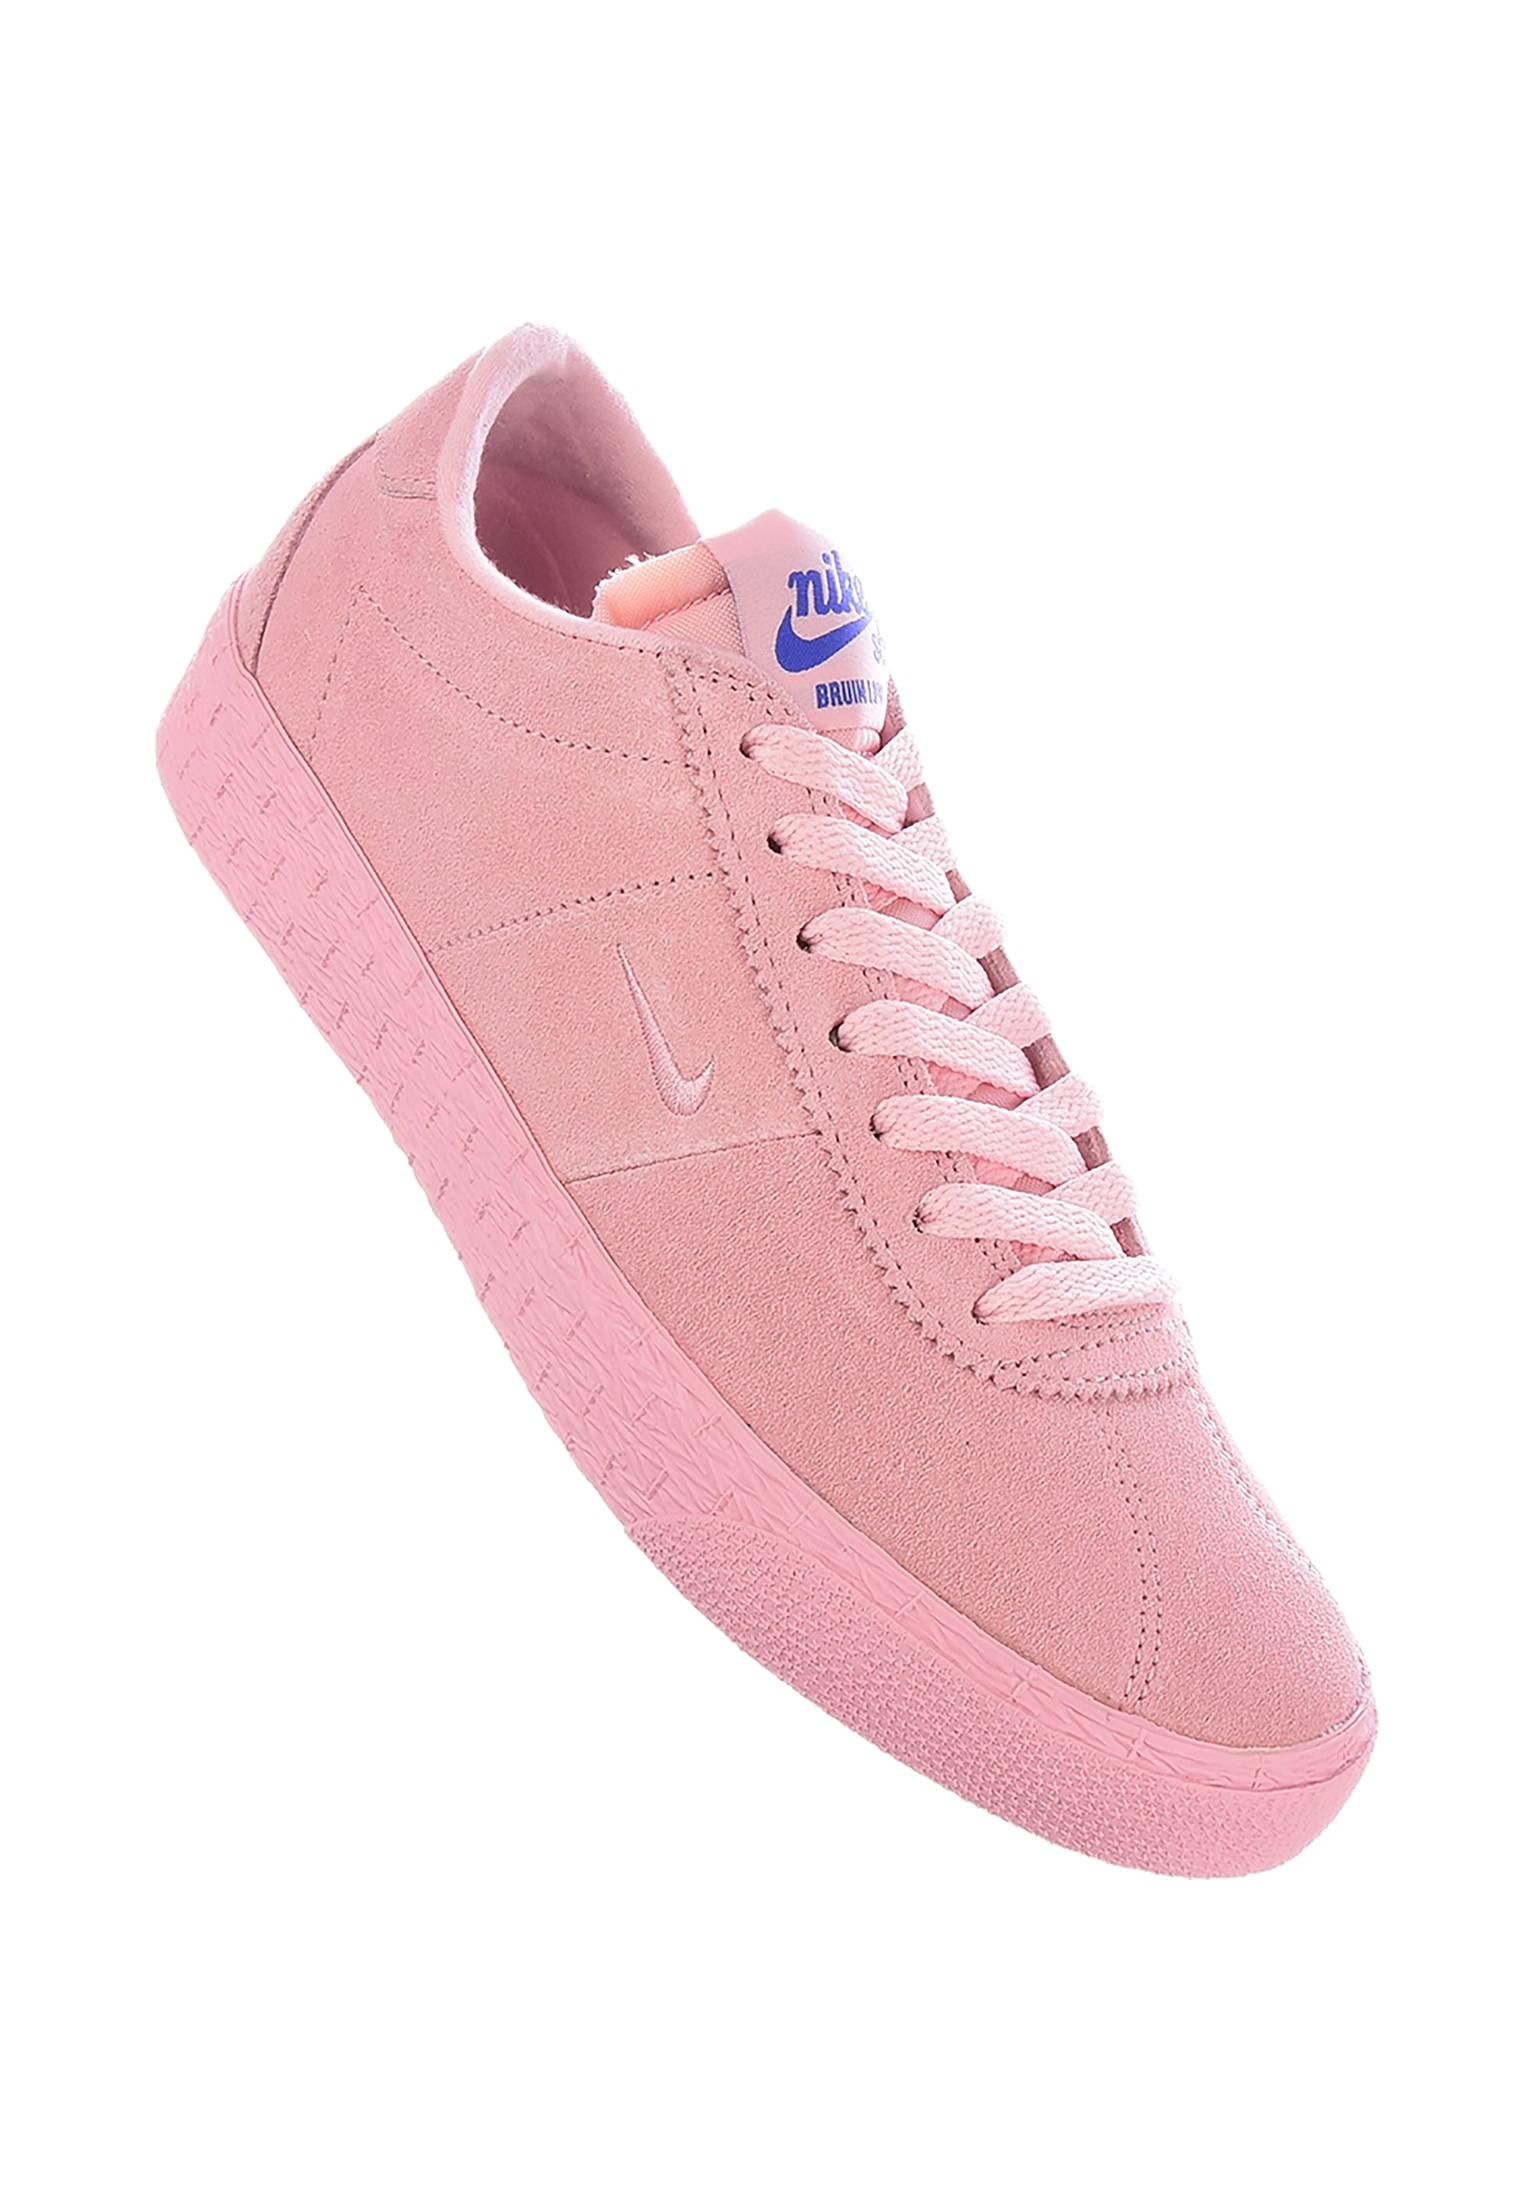 0fe69cc2e88eb Zoom Bruin Ultra NBA Nike SB All Shoes in bubblegum-bubblegum-universityred  for Women